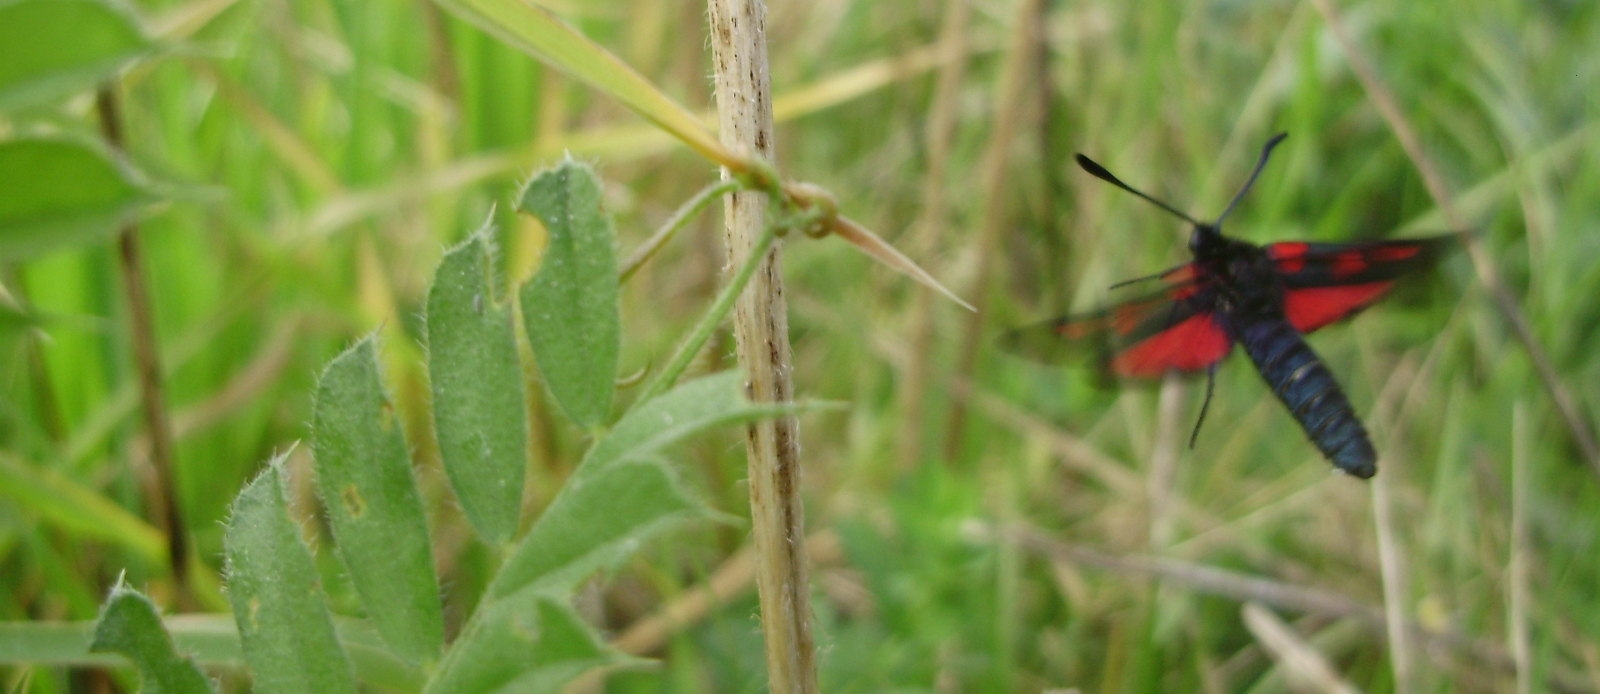 Zygaena trifolii en vuelo